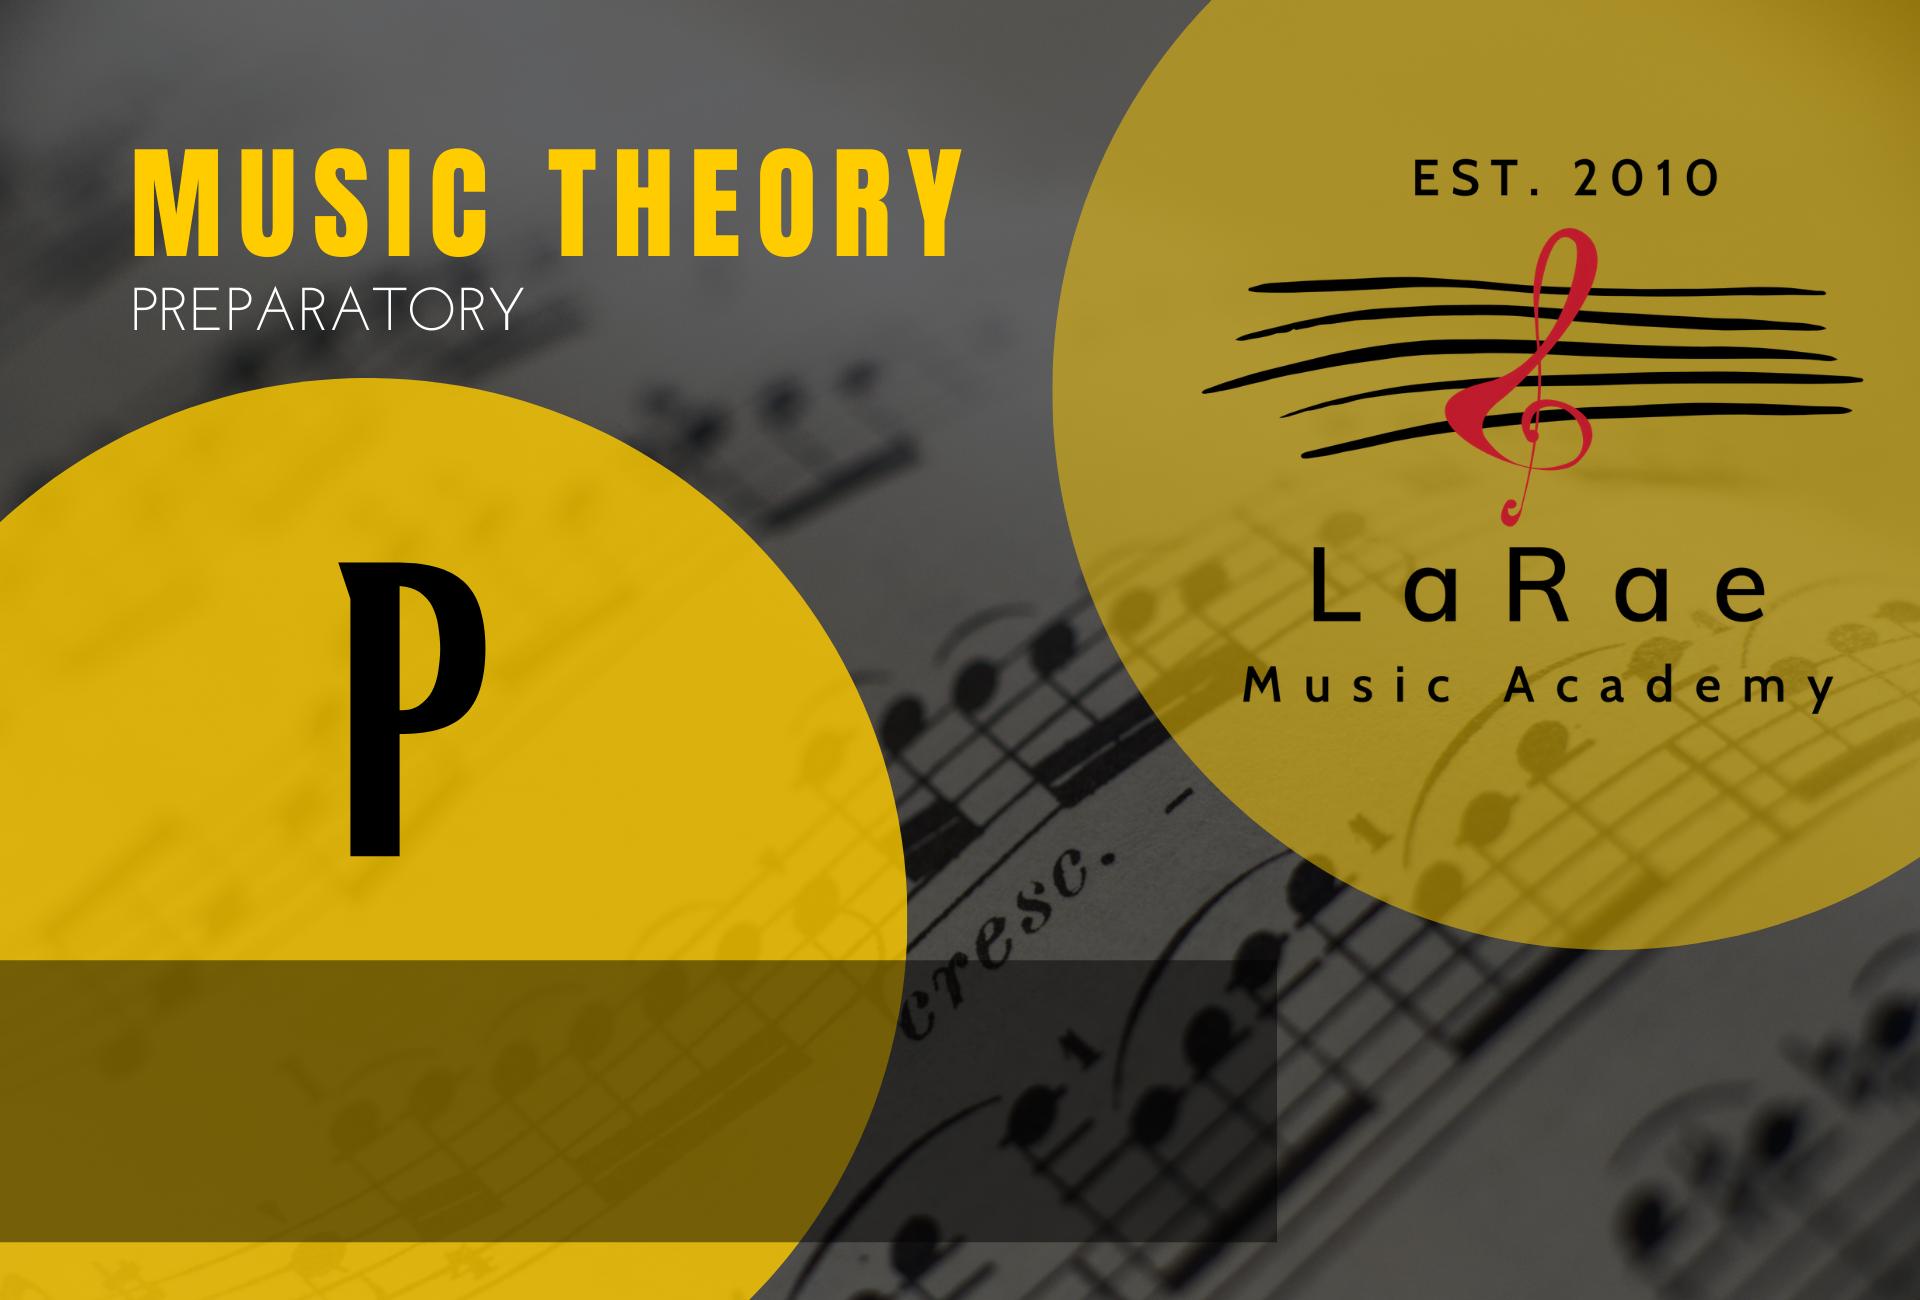 Music Theory Preparatory Course